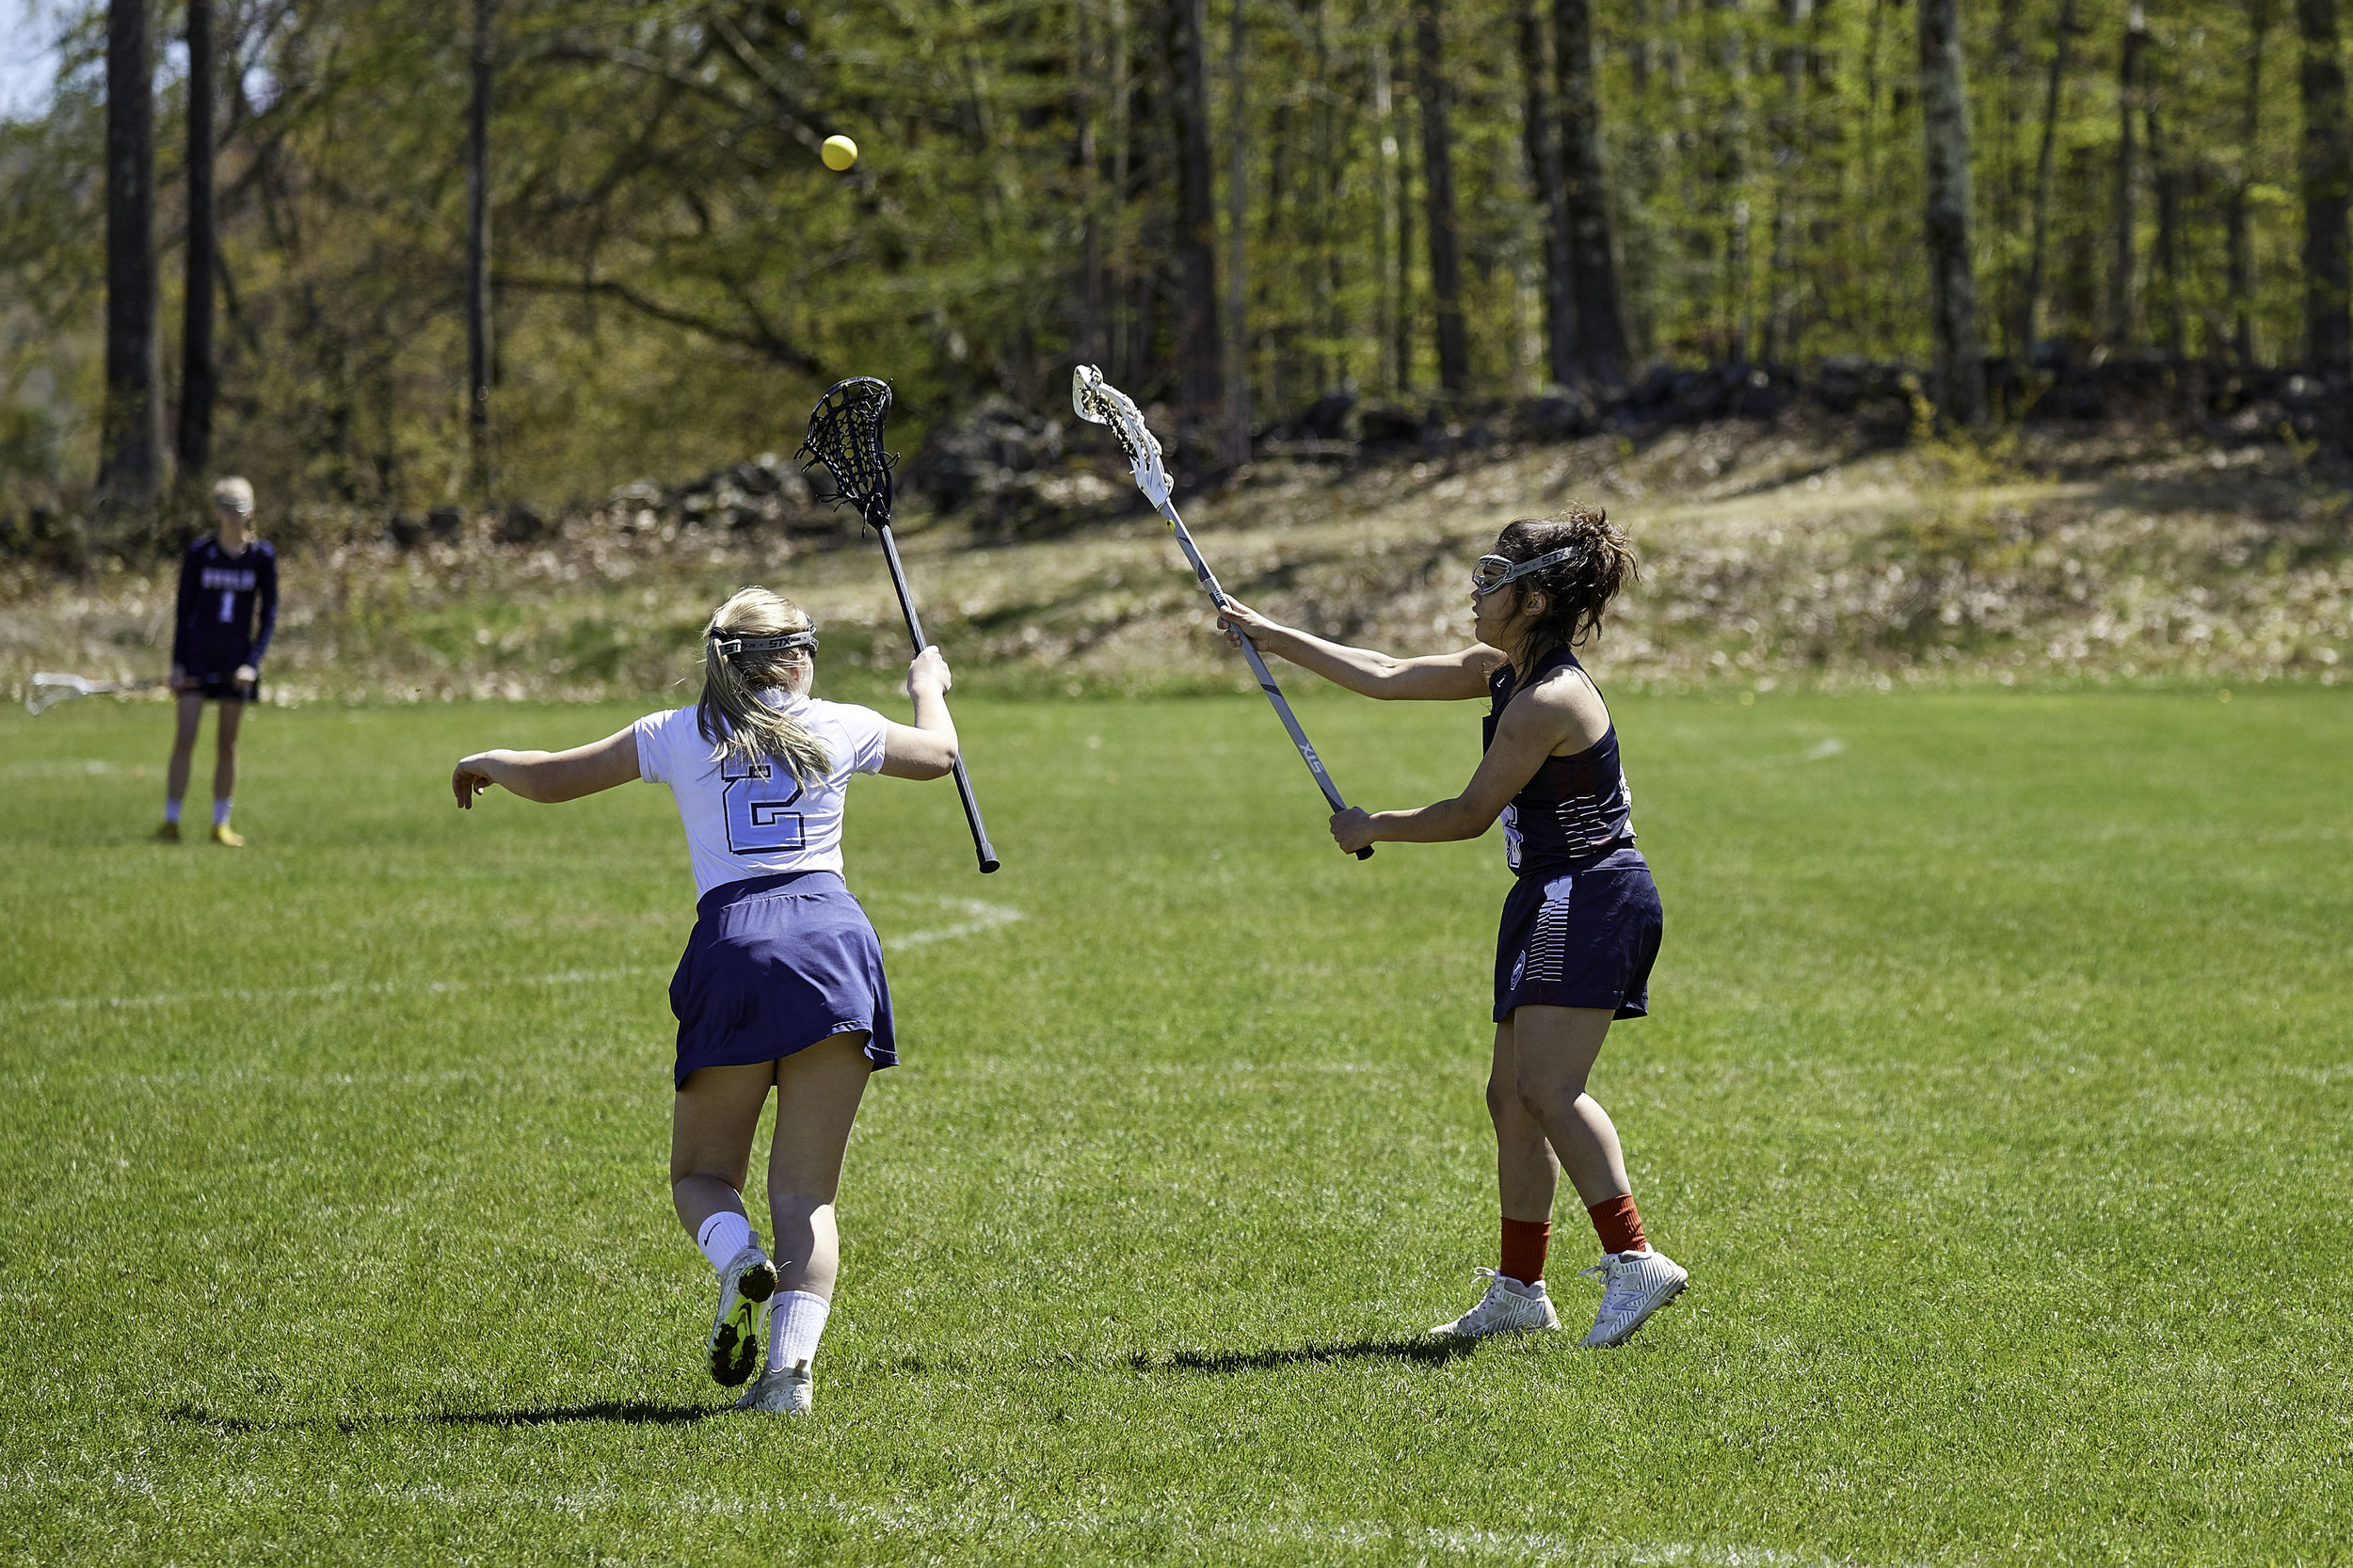 Girls Lacrosse vs. Stoneleigh Burnham School - May 11, 2019 - May 10, 2019193117.jpg